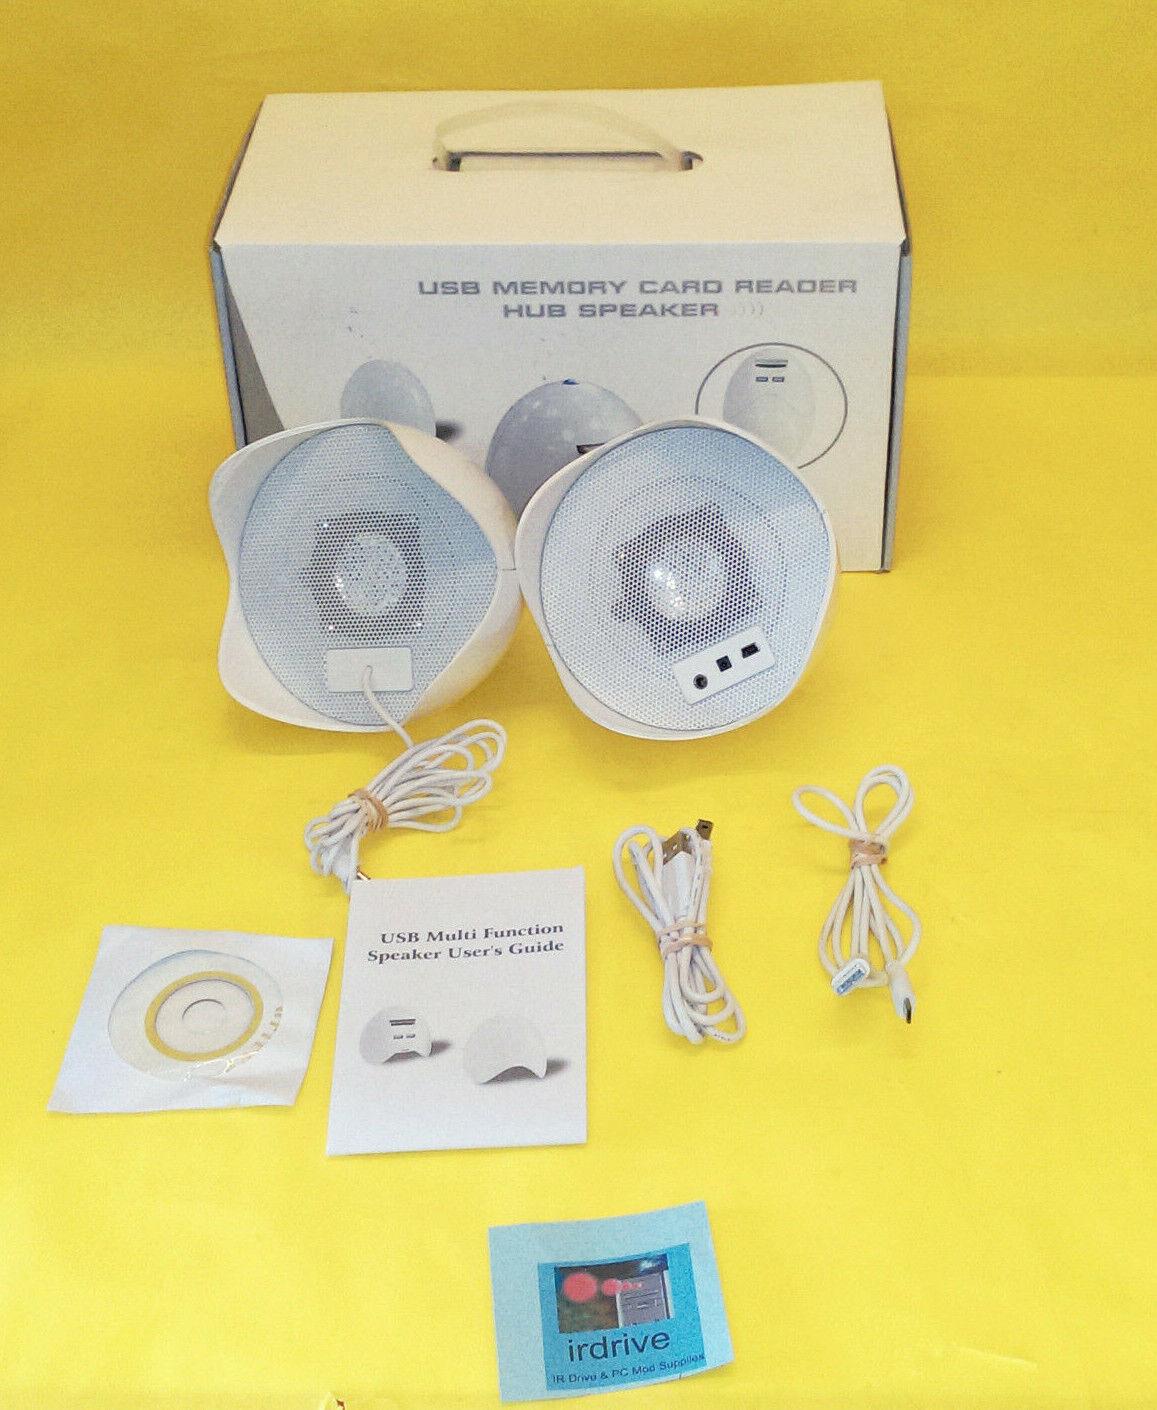 Egg-Shape USB Speakers/2.0 Hub/Memory Card Reader: Notebook,